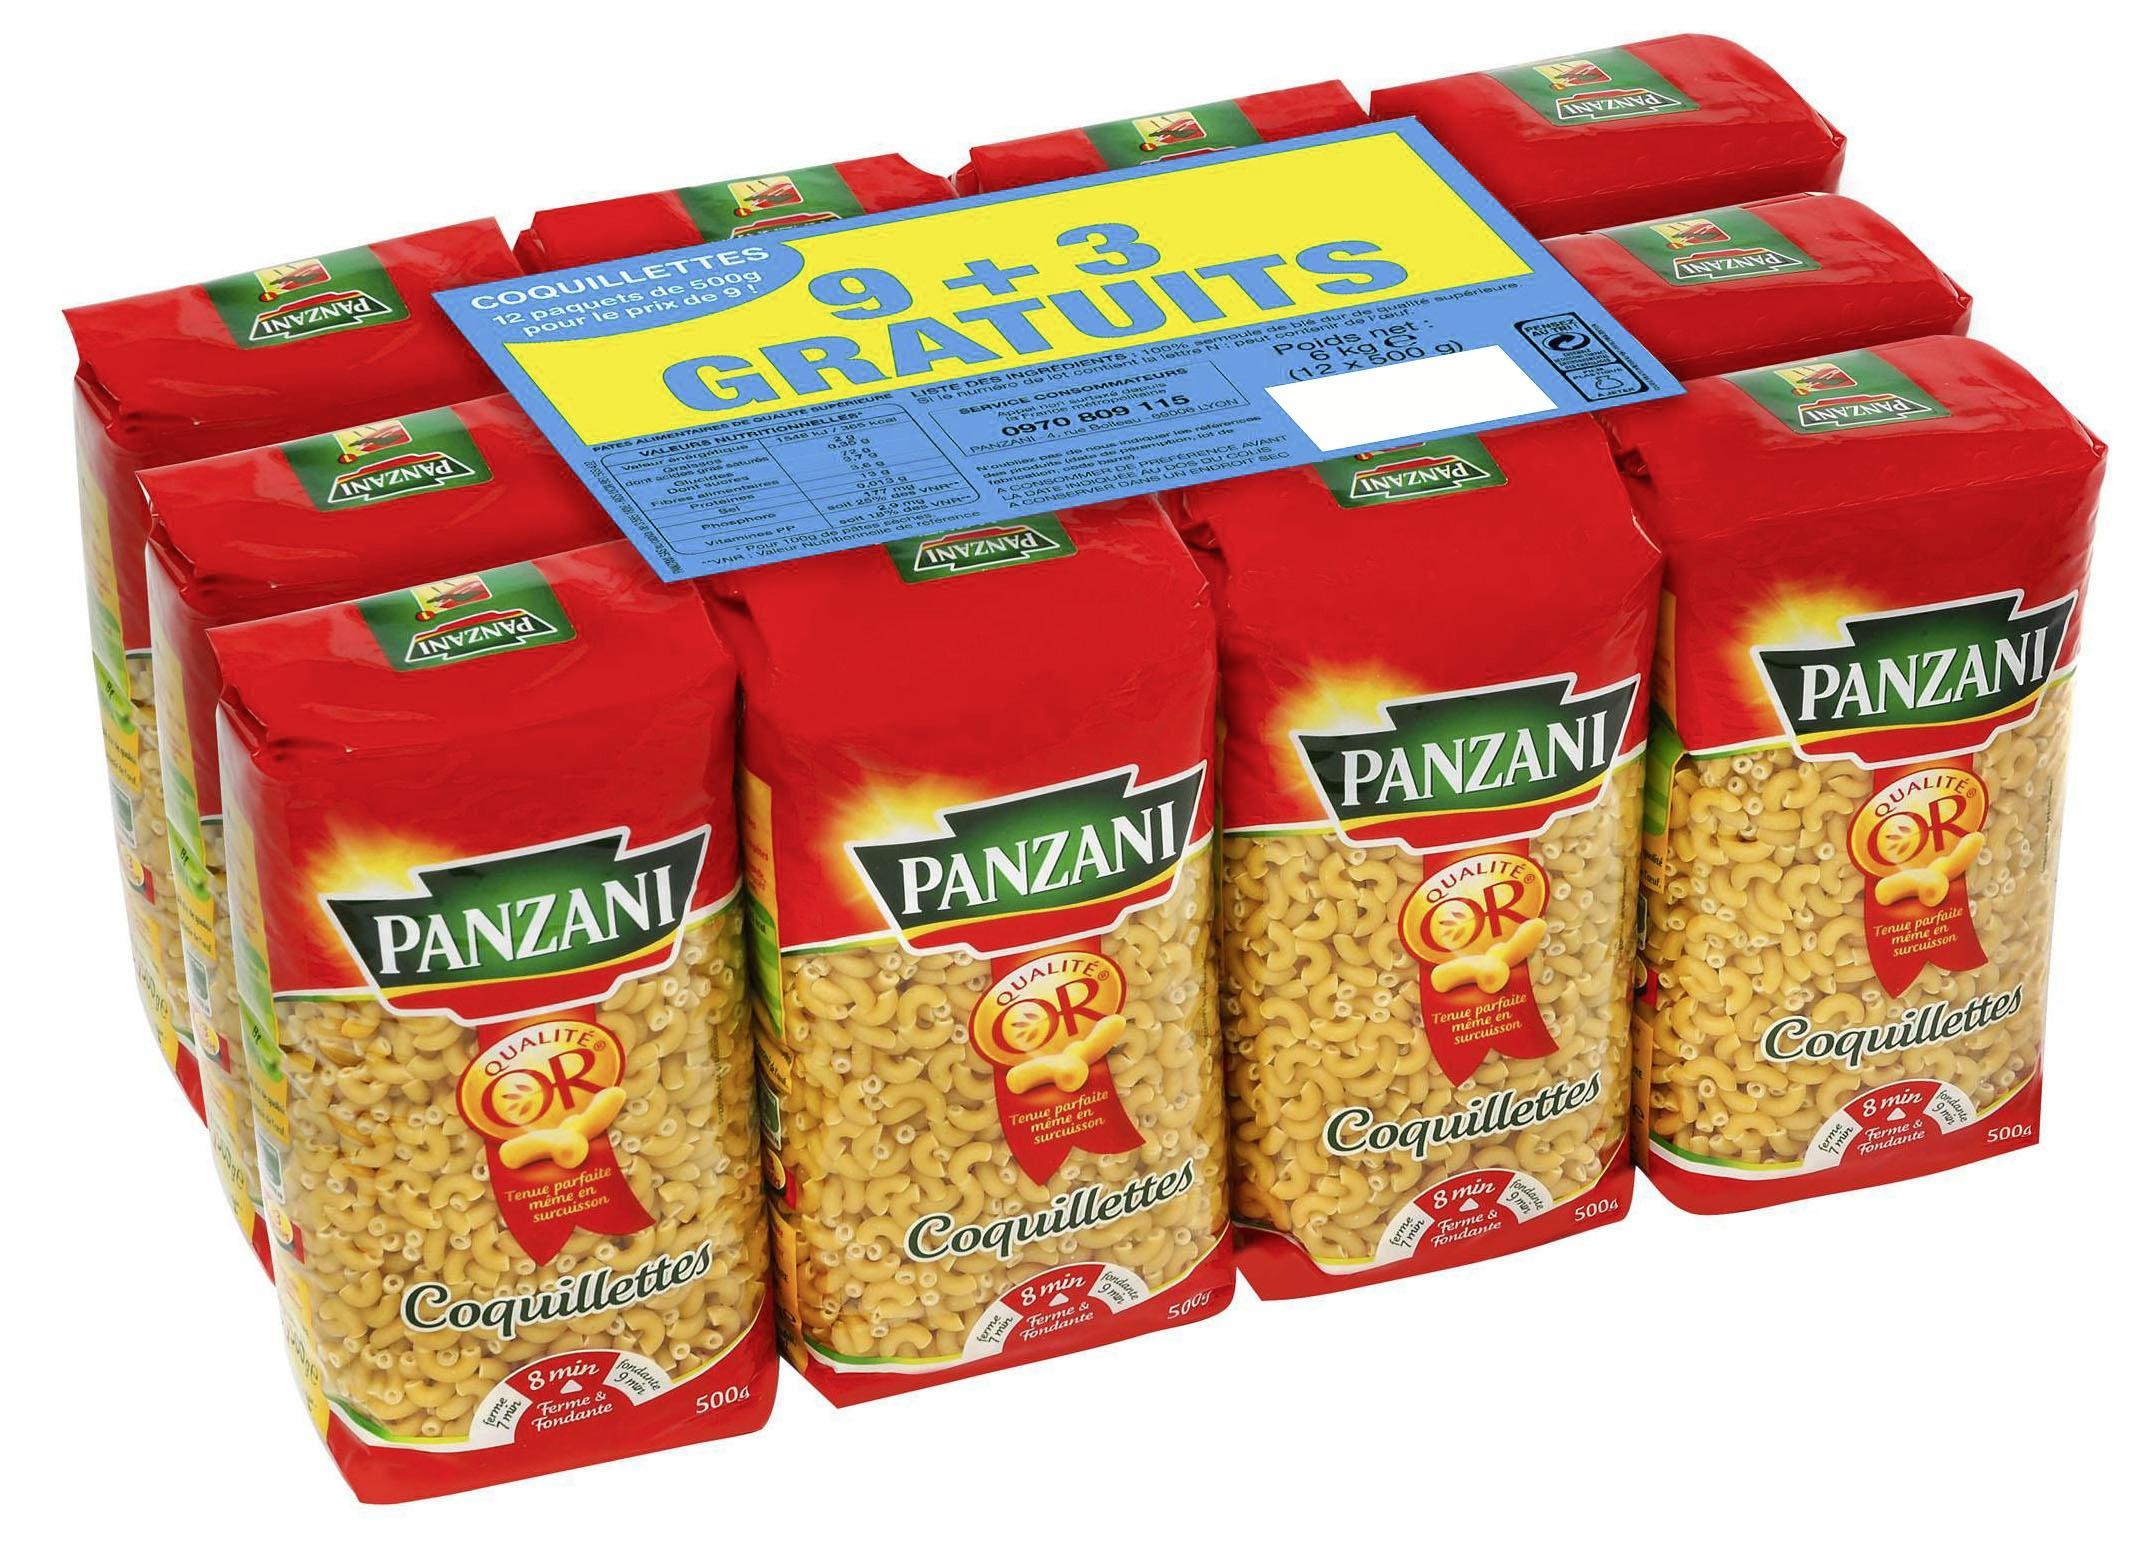 Lot de 12 paquets de Pâtes Panzani (coquillettes ou torti) - 500g